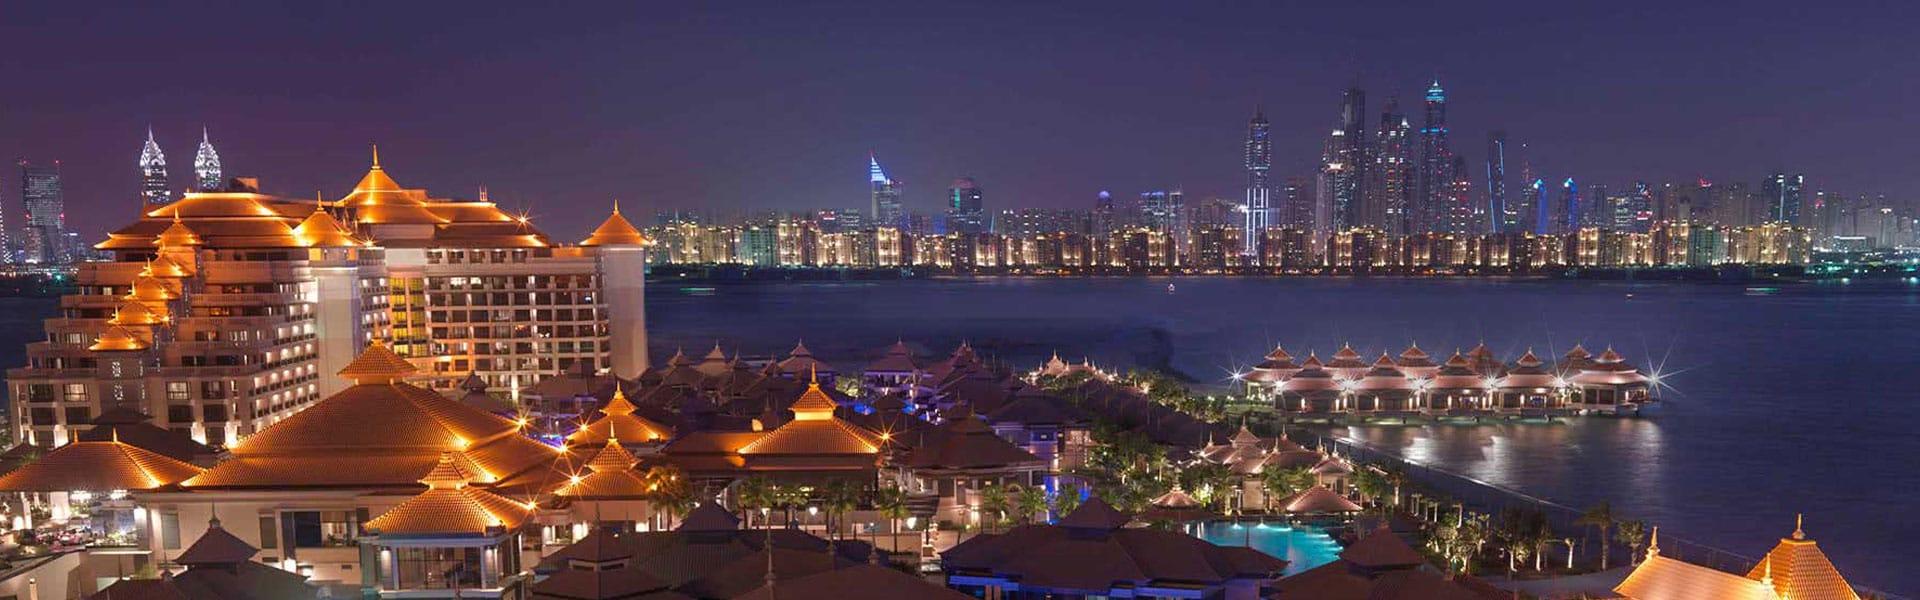 Luxury Hotel Group About Anantara Resort Hotels Spas Maldives Trip Testimoni Previous